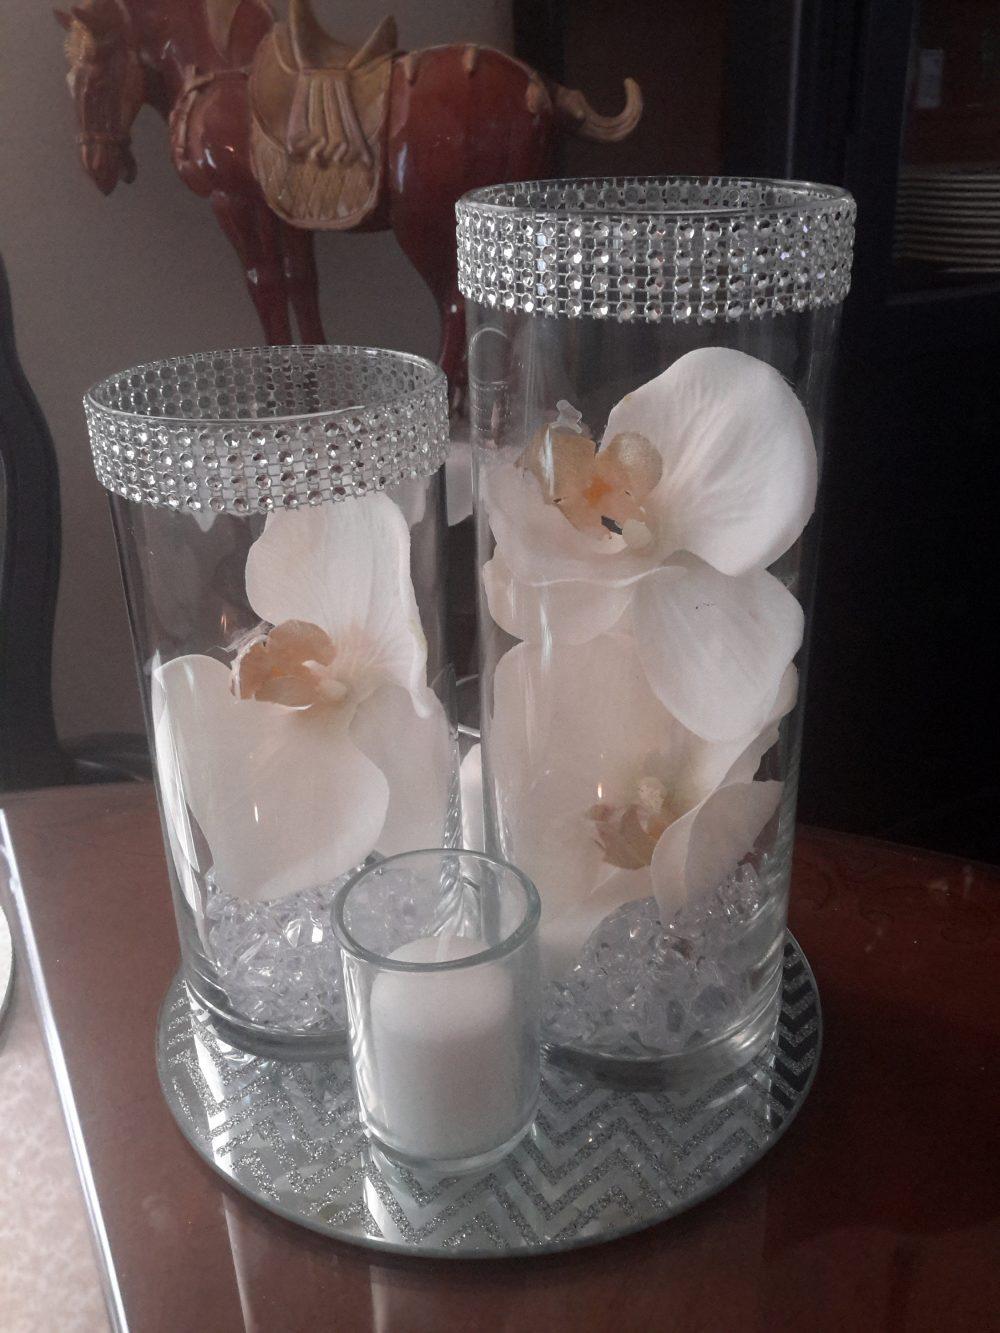 Floral Cylinder Vase Set W/Orchids & Silver/Gold Bling Glitter Mirror-Wedding-50Th Anniversary-25Th Anniversary-Birthday-Decor-Centerpiece